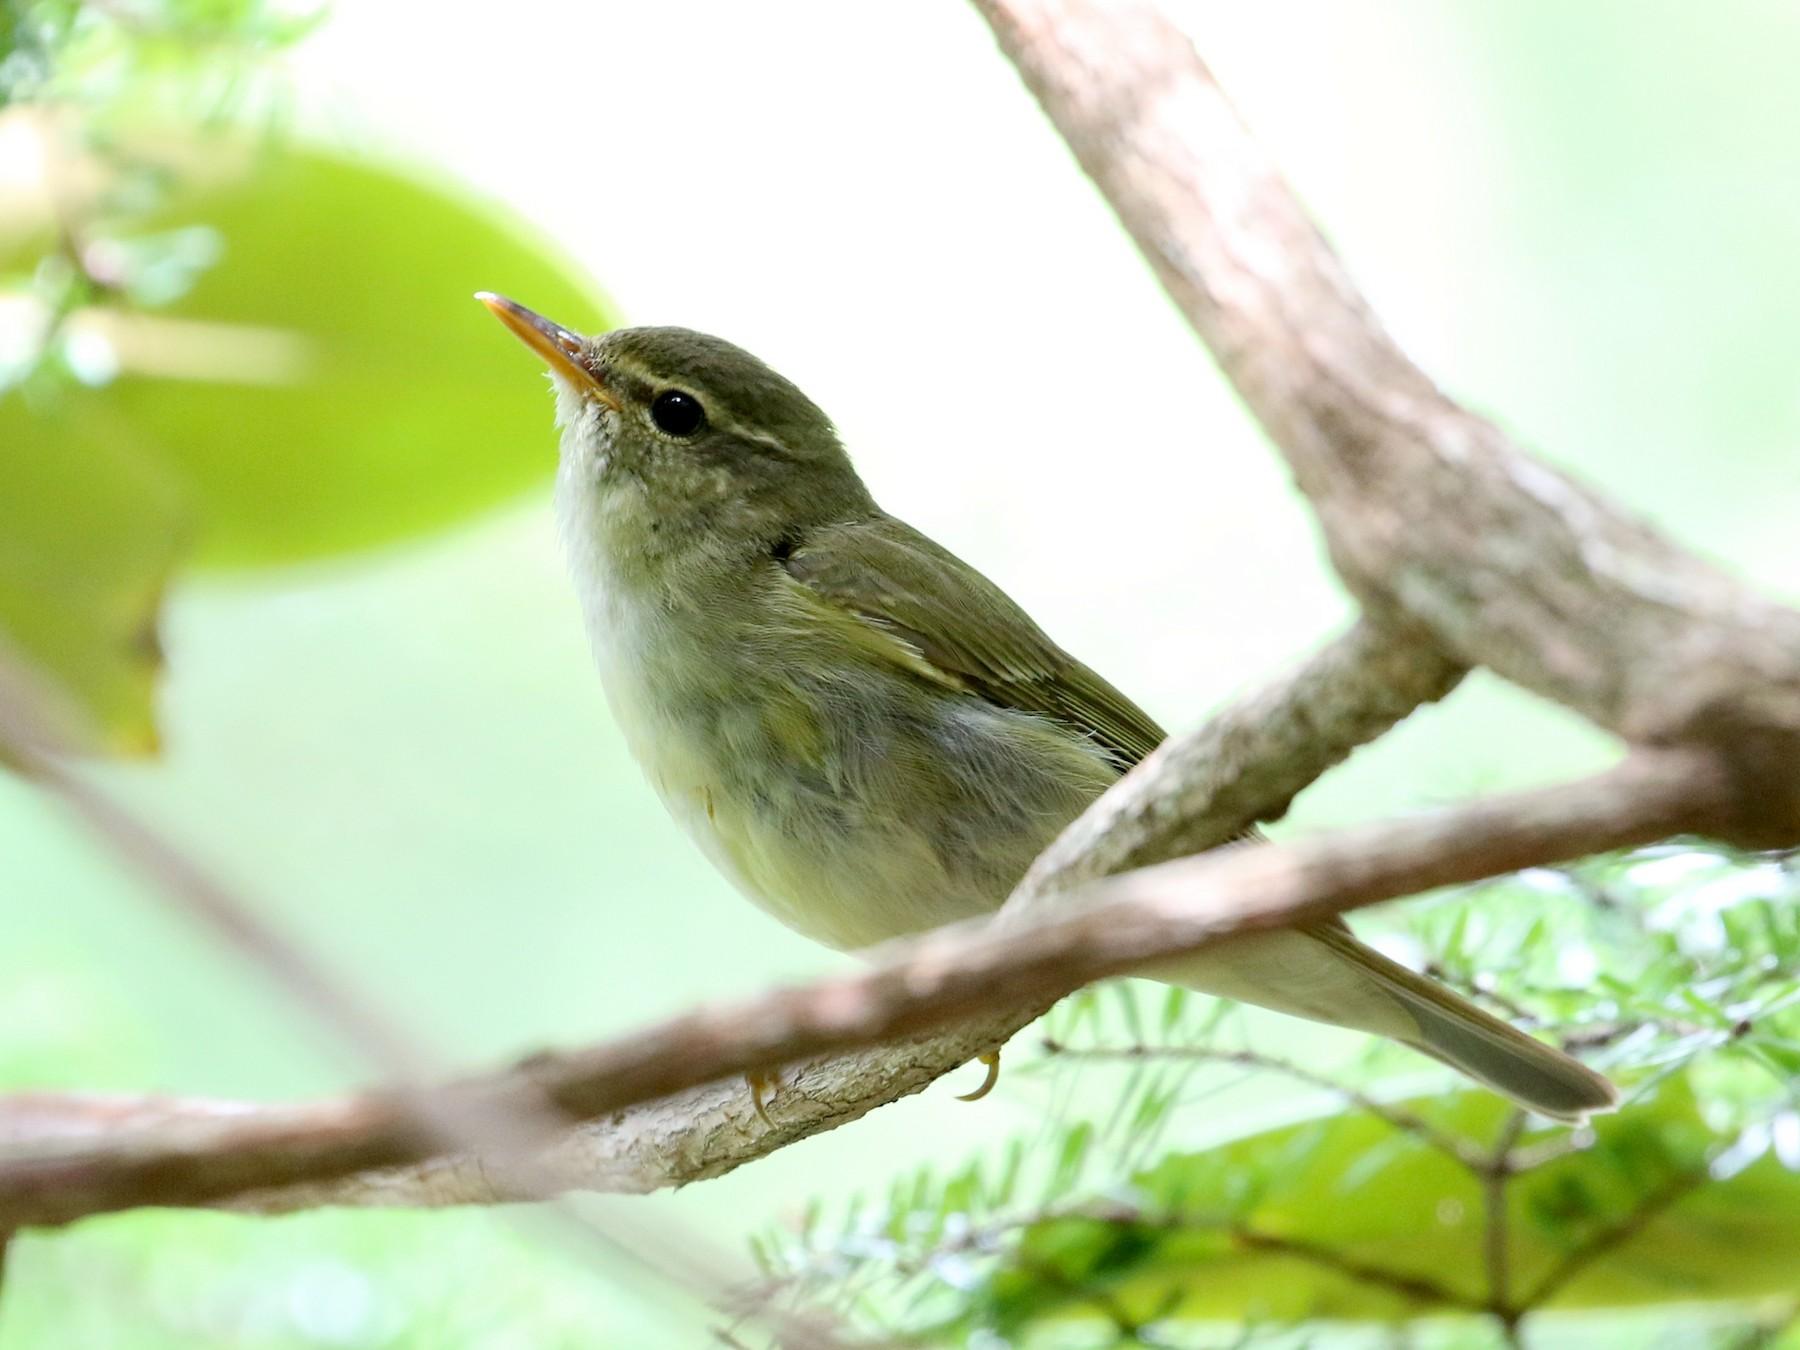 Japanese Leaf Warbler - Atsushi Shimazaki